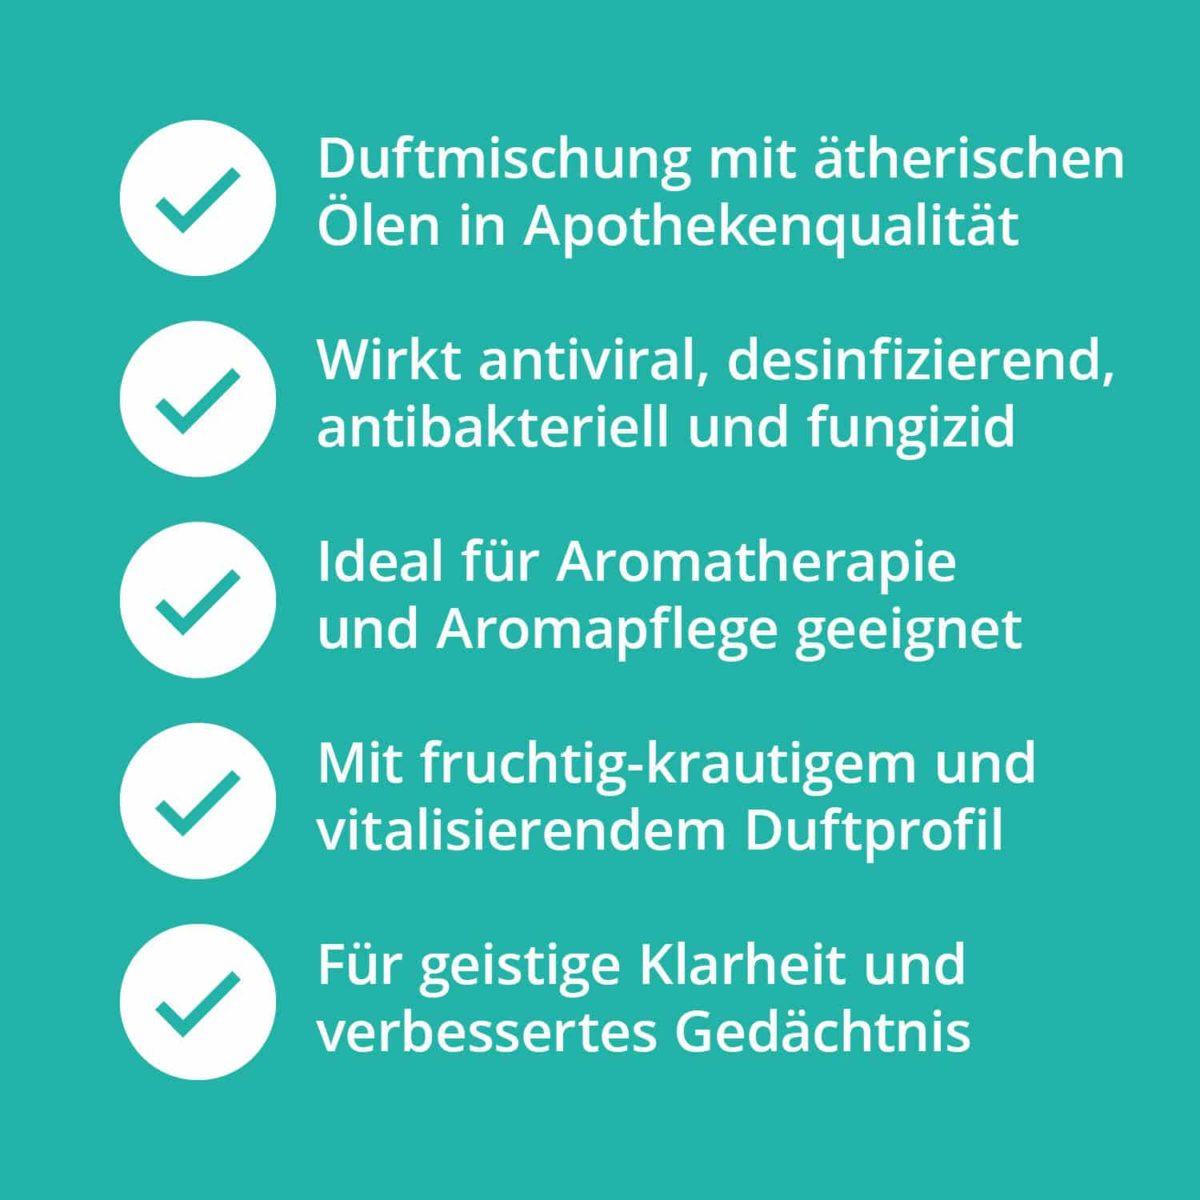 Casida Focusing Aroma-Blend Konzentration & Fokus - 5 ml 17377200 PZN Apotheke Energie Gedächtnis Aromatherapie Aromapflege Aromaschmuck Diffuser7